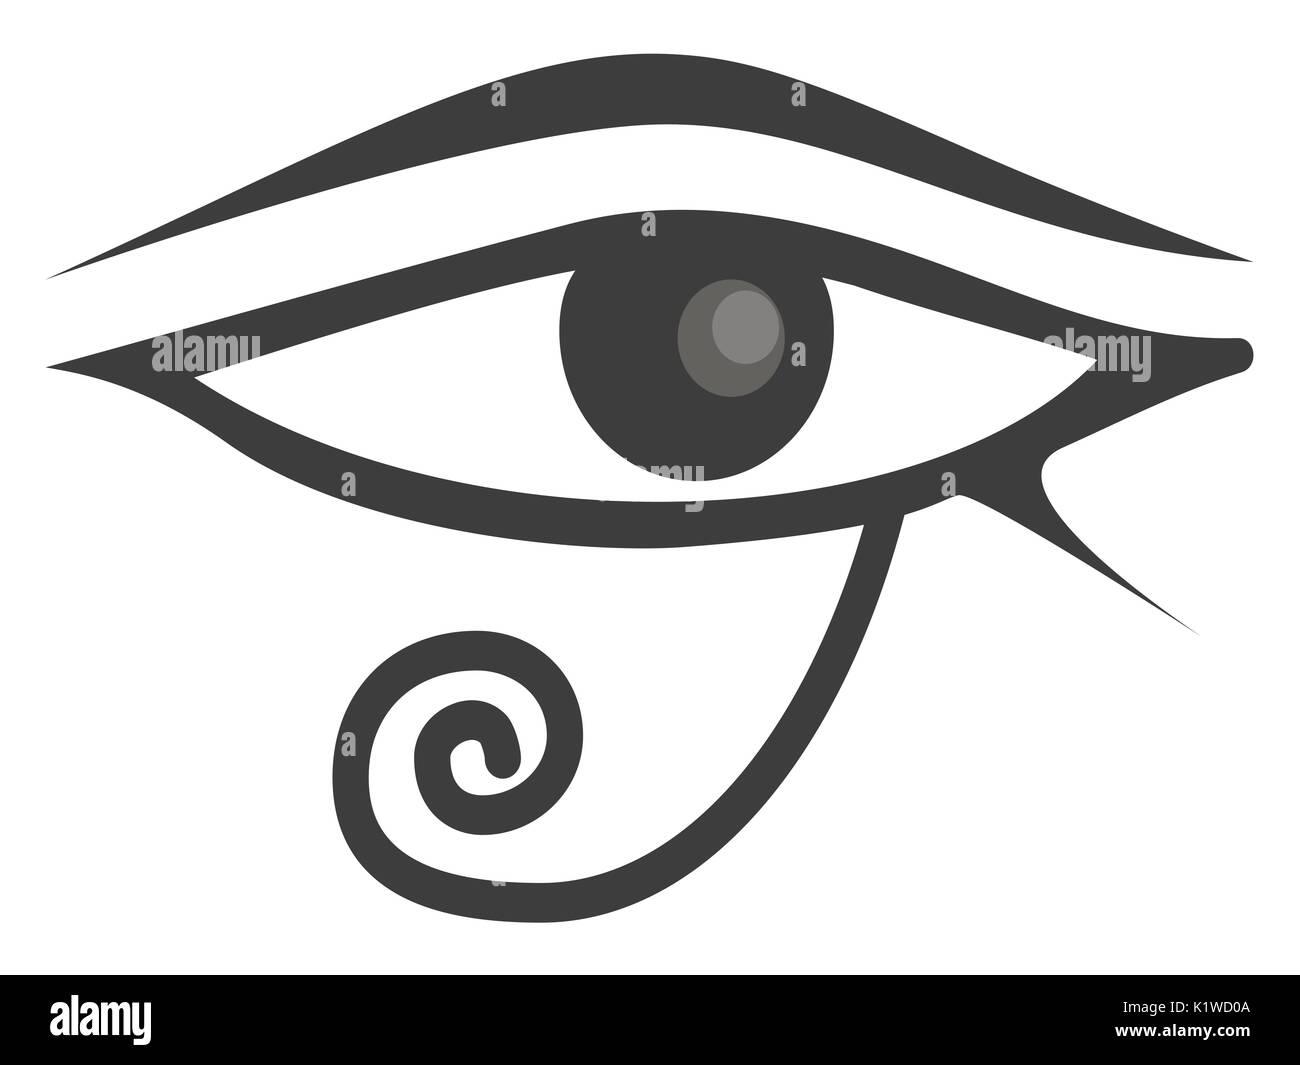 Eye of ra stock photos eye of ra stock images alamy egyptian eye of horus eye of ra stock image biocorpaavc Images